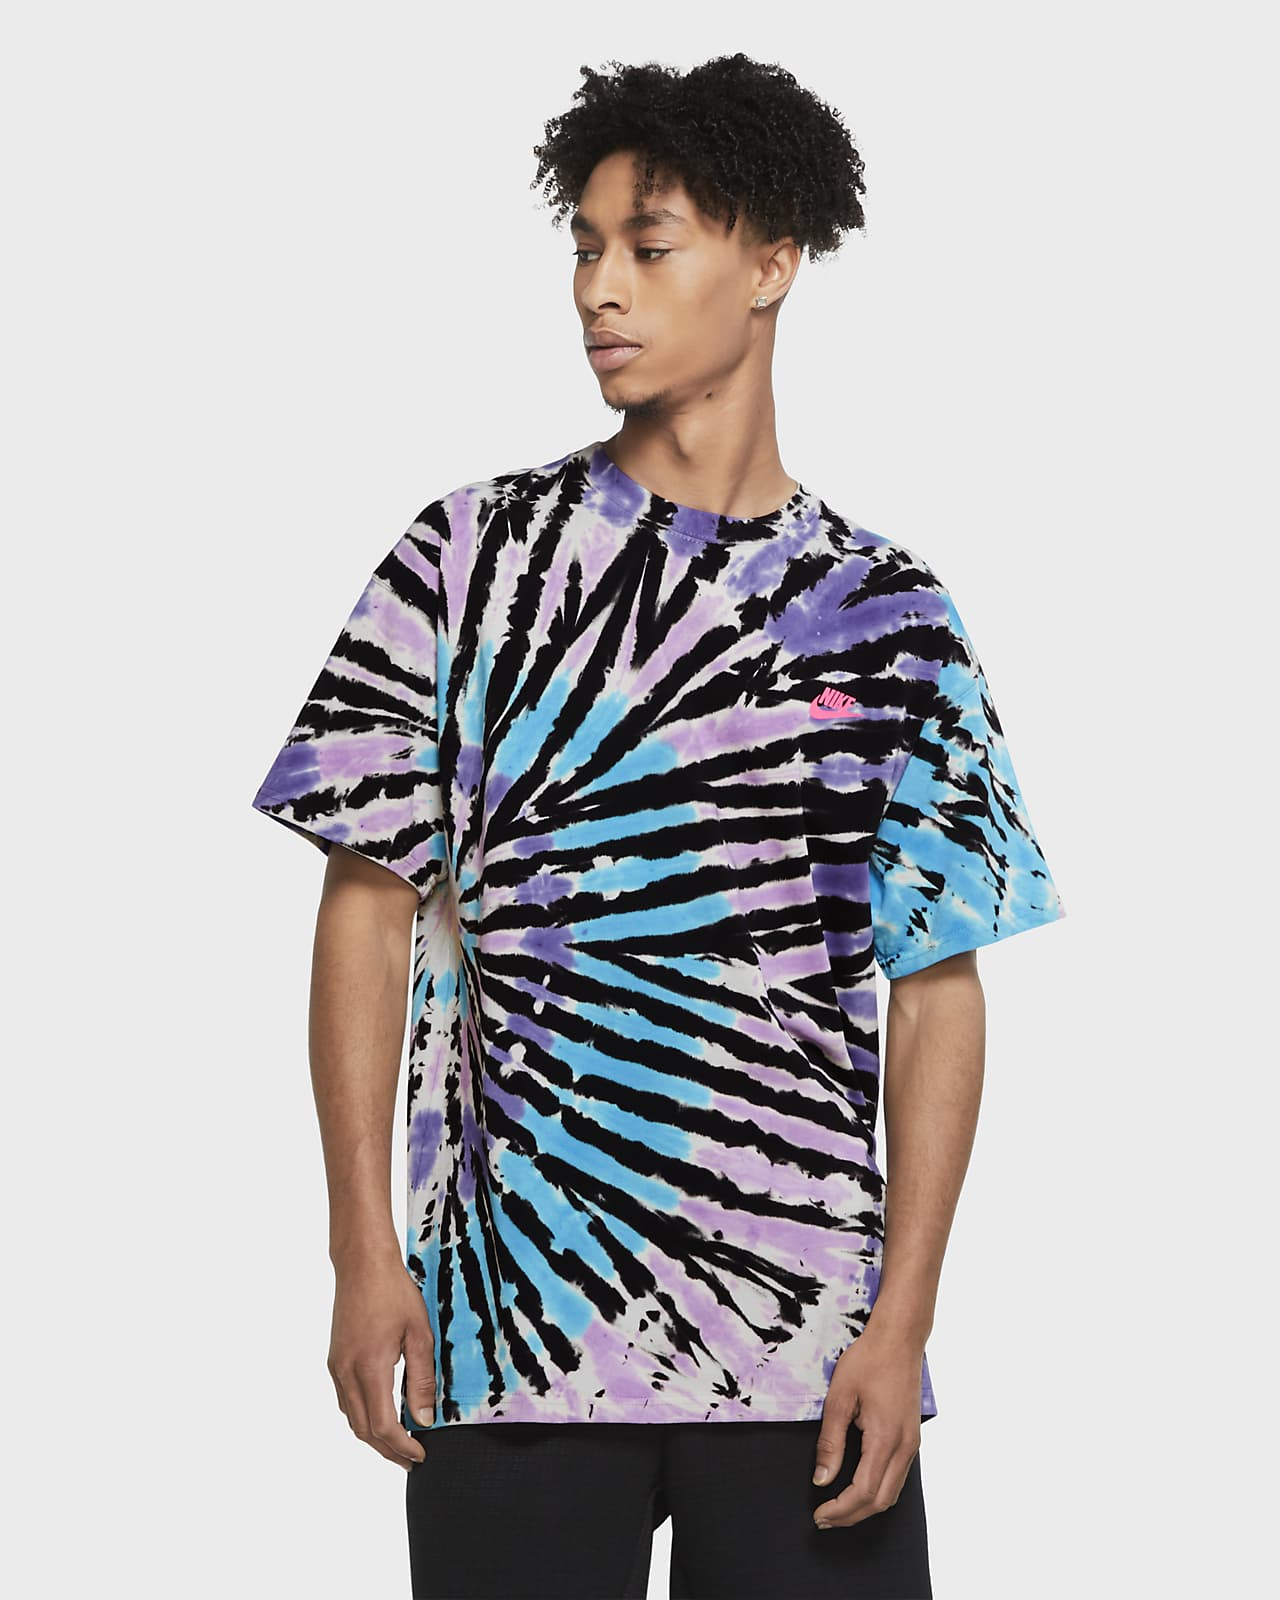 Nike Sportswear Tie-Dye-T-Shirt für Herren